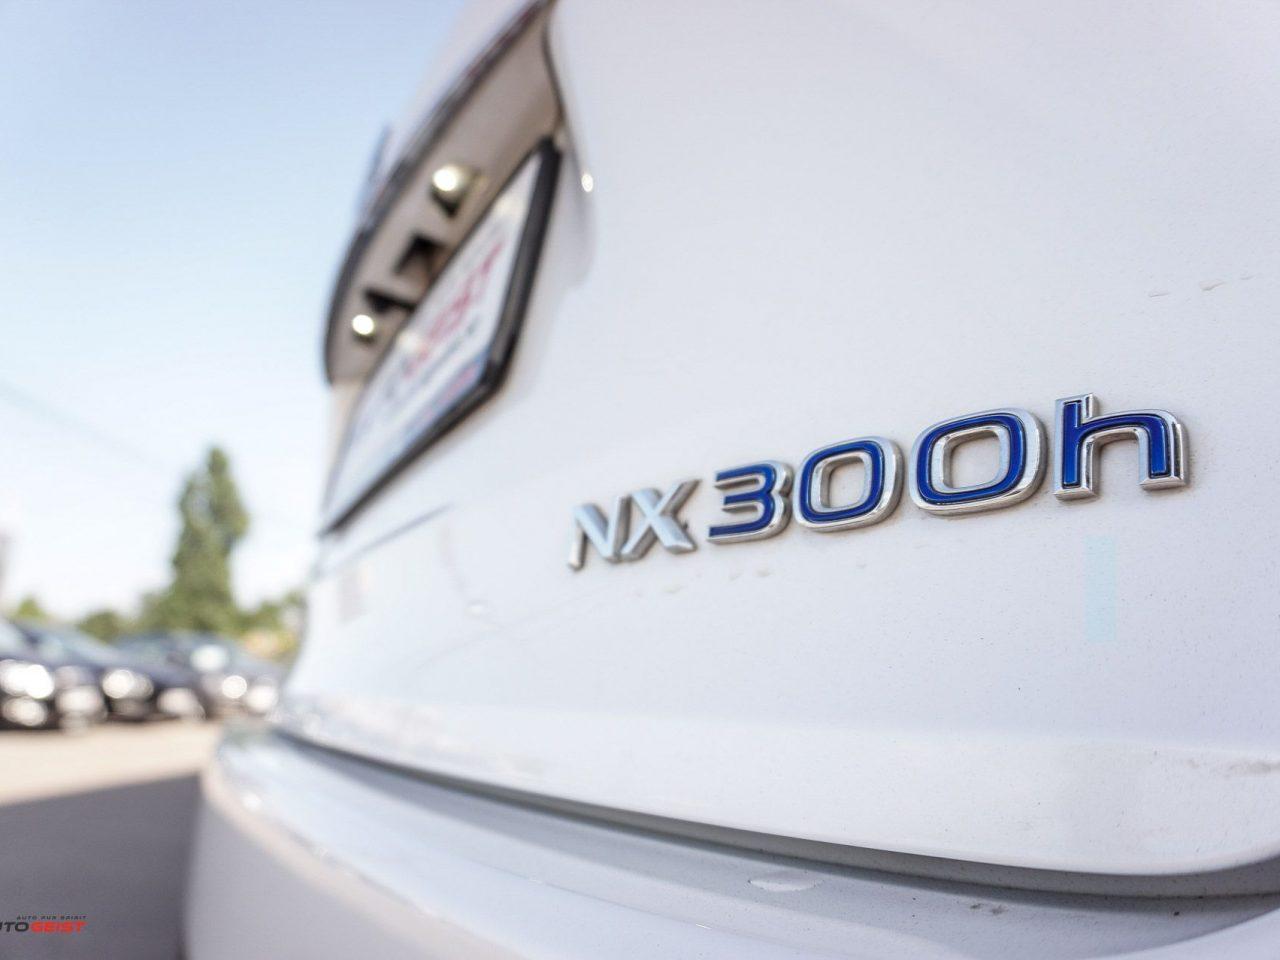 lexus-nx300h-hybrid-1023-02442